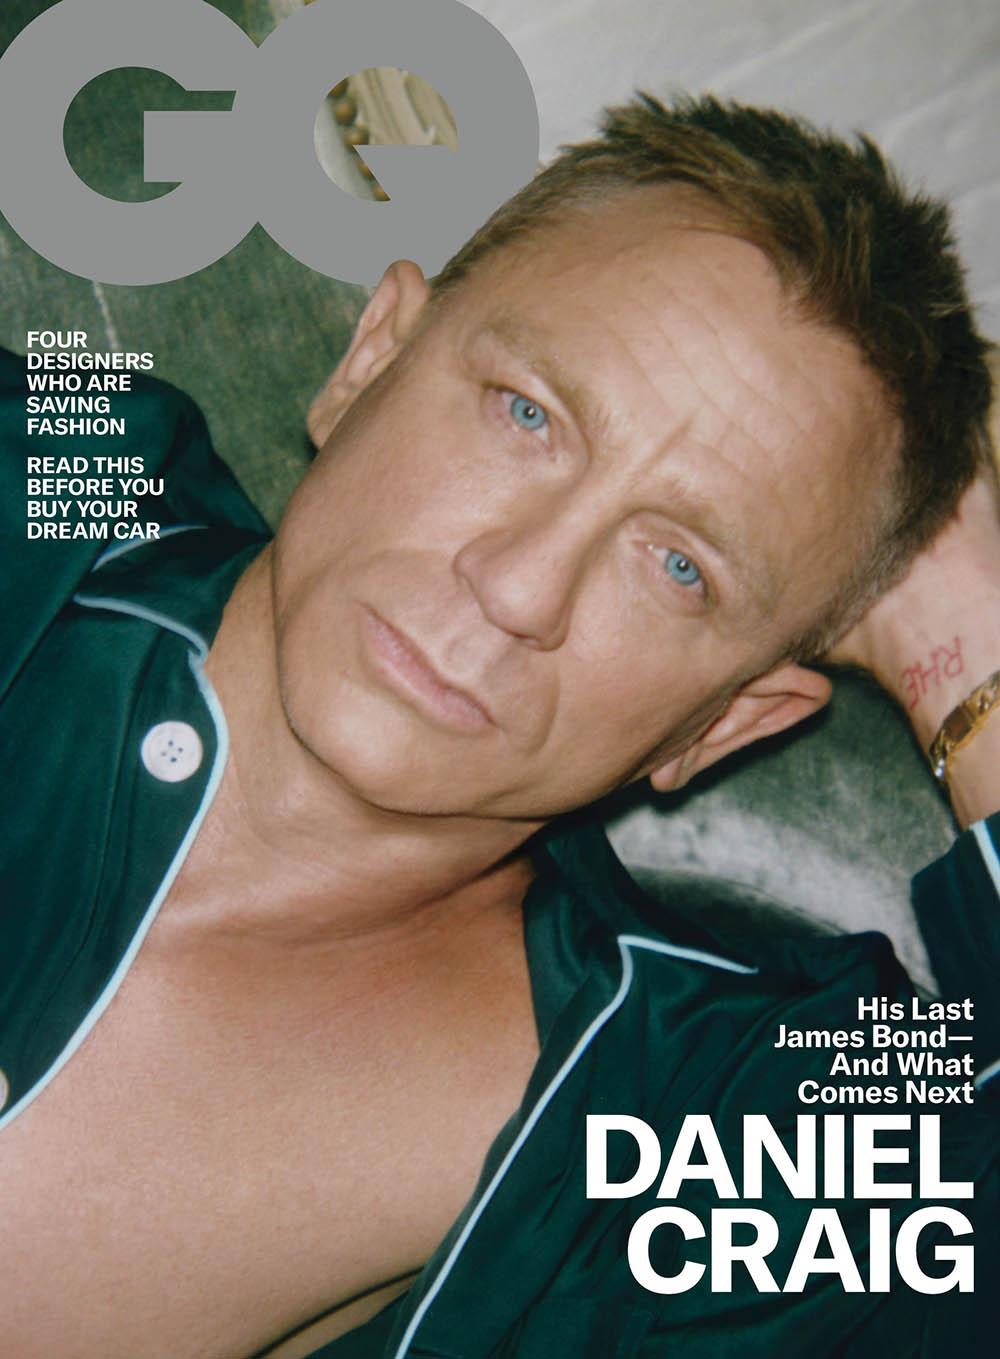 Daniel Craig covers GQ USA April 2020 by Lachlan Bailey